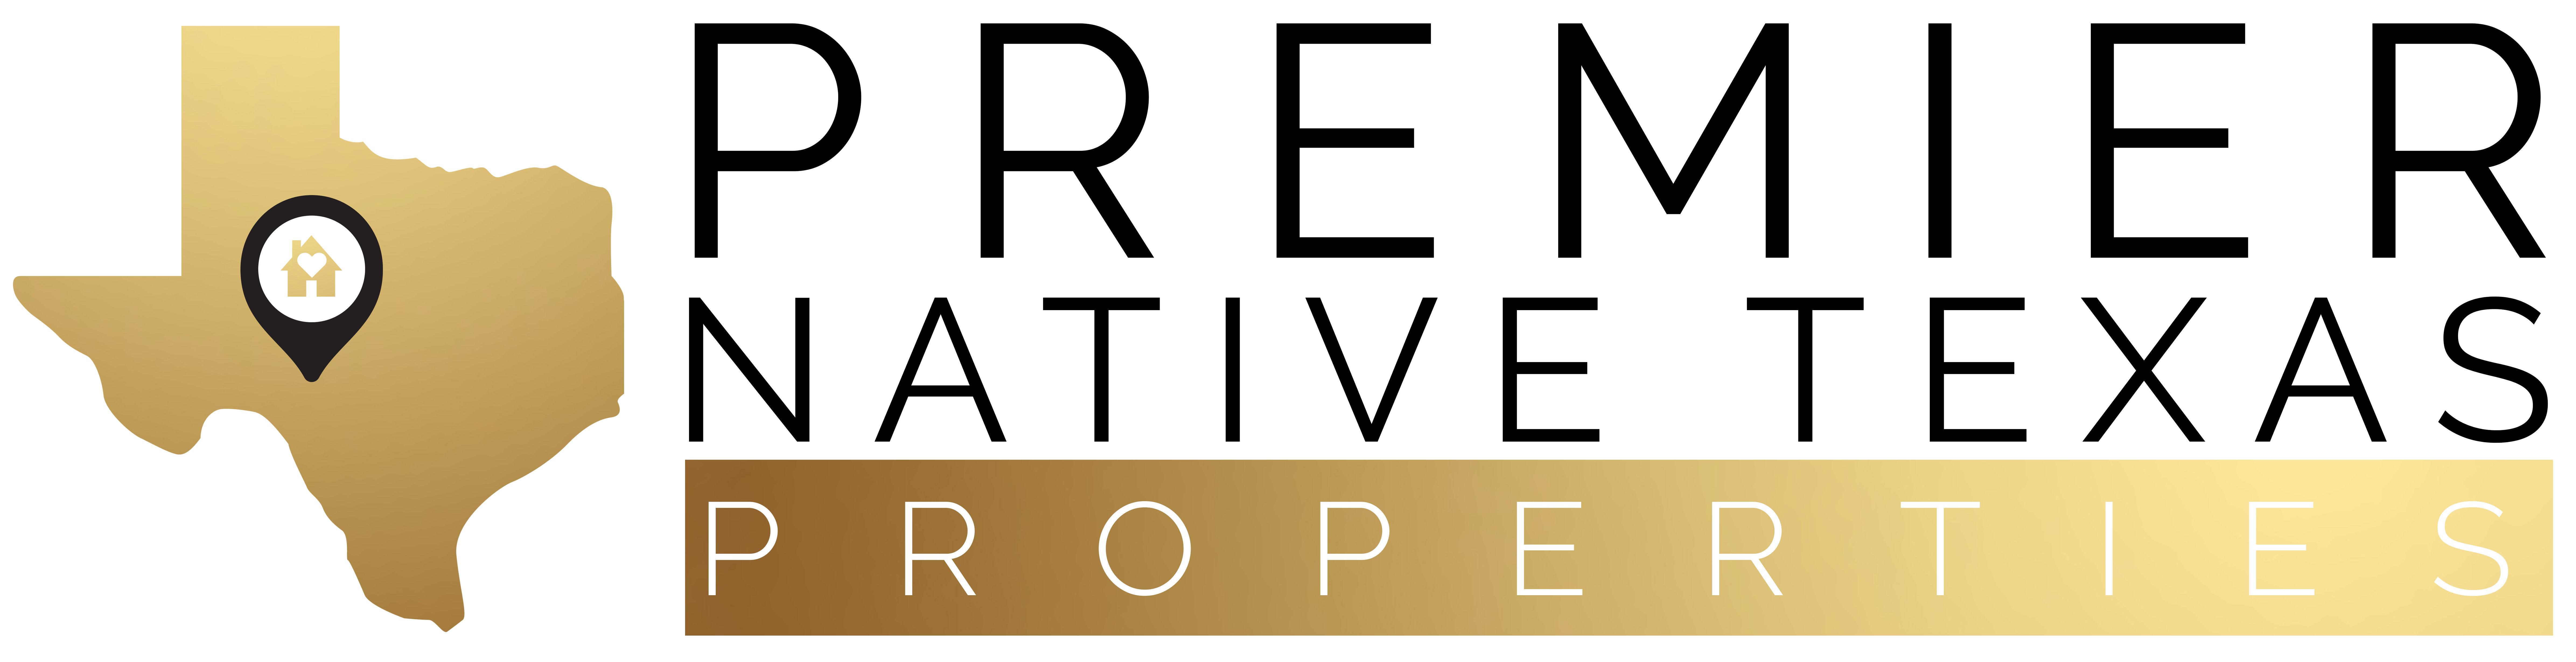 Premier Native Texas Properties, LLC